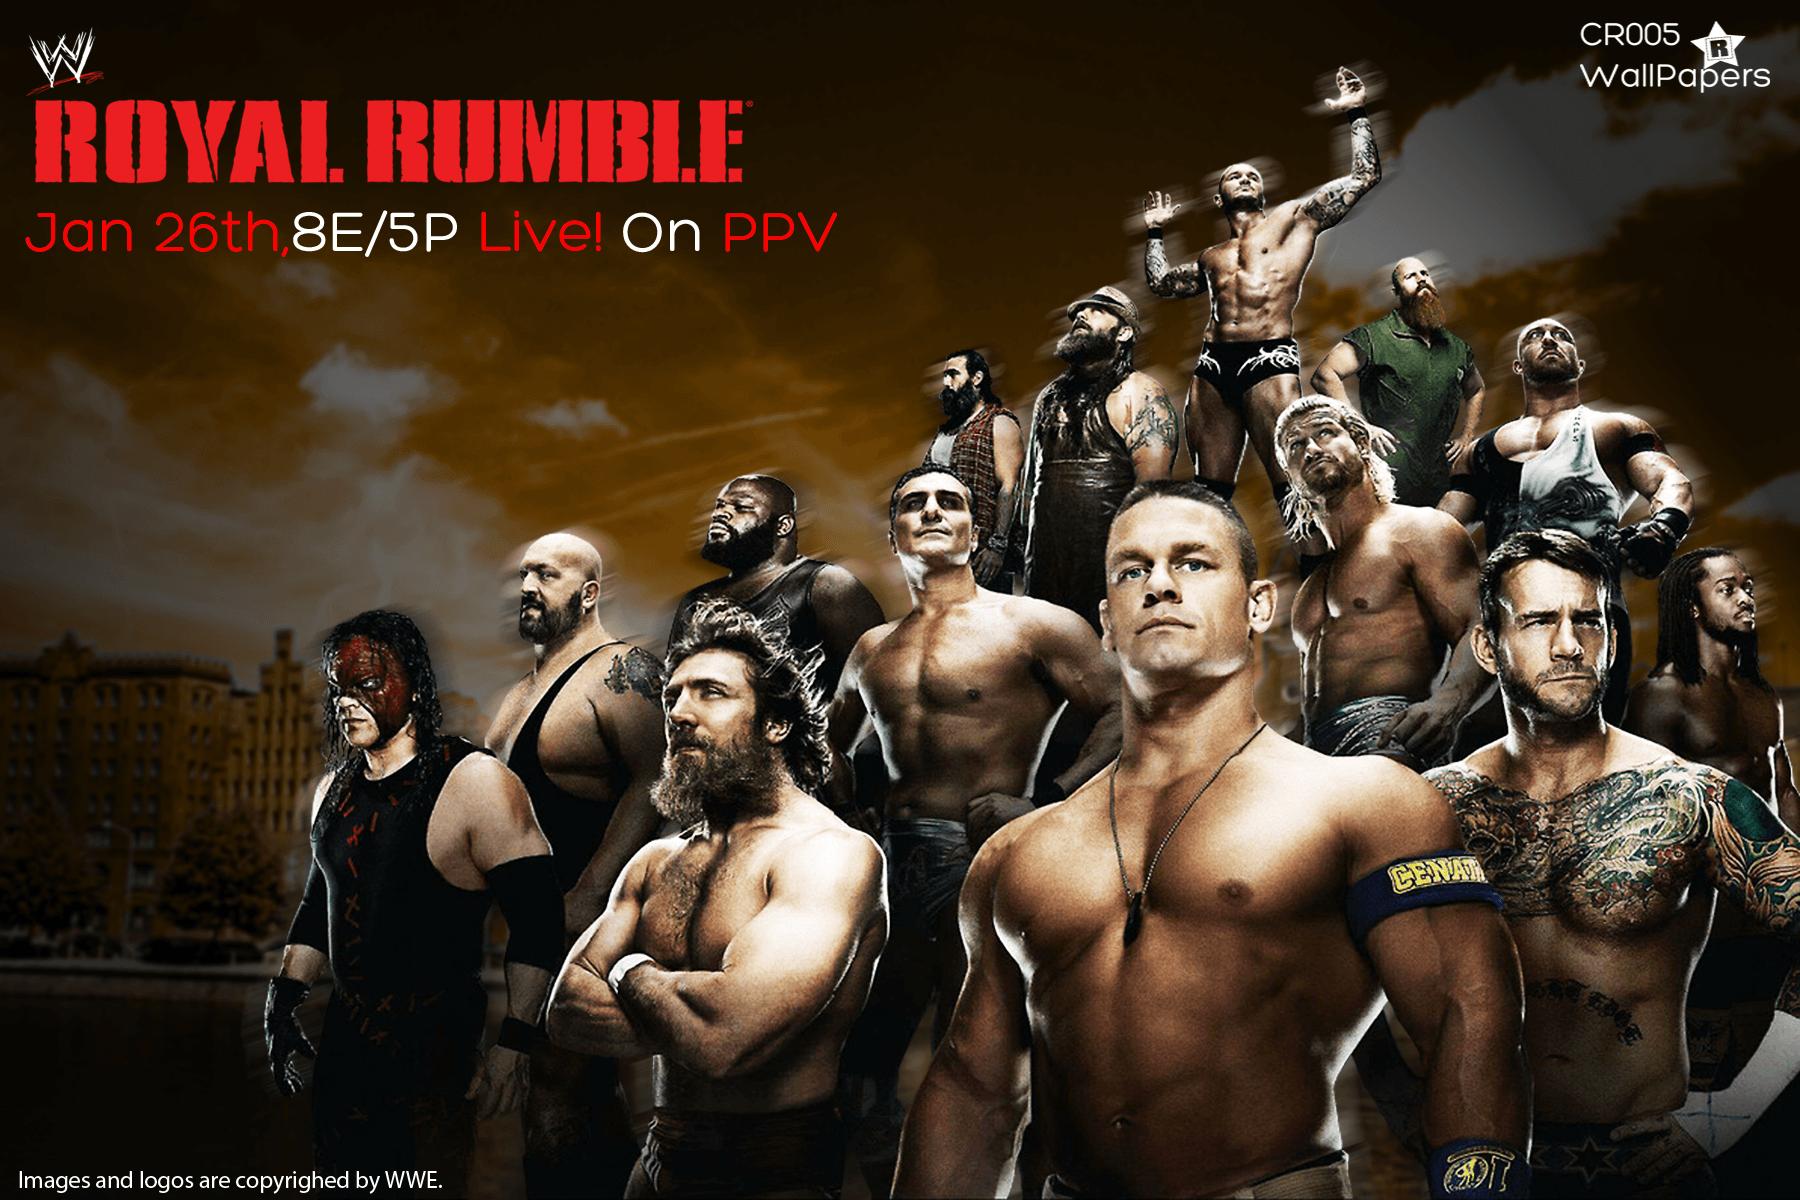 WWE Royal Rumble 2014 Wallpaper. by ChrisRobert005 on DeviantArt